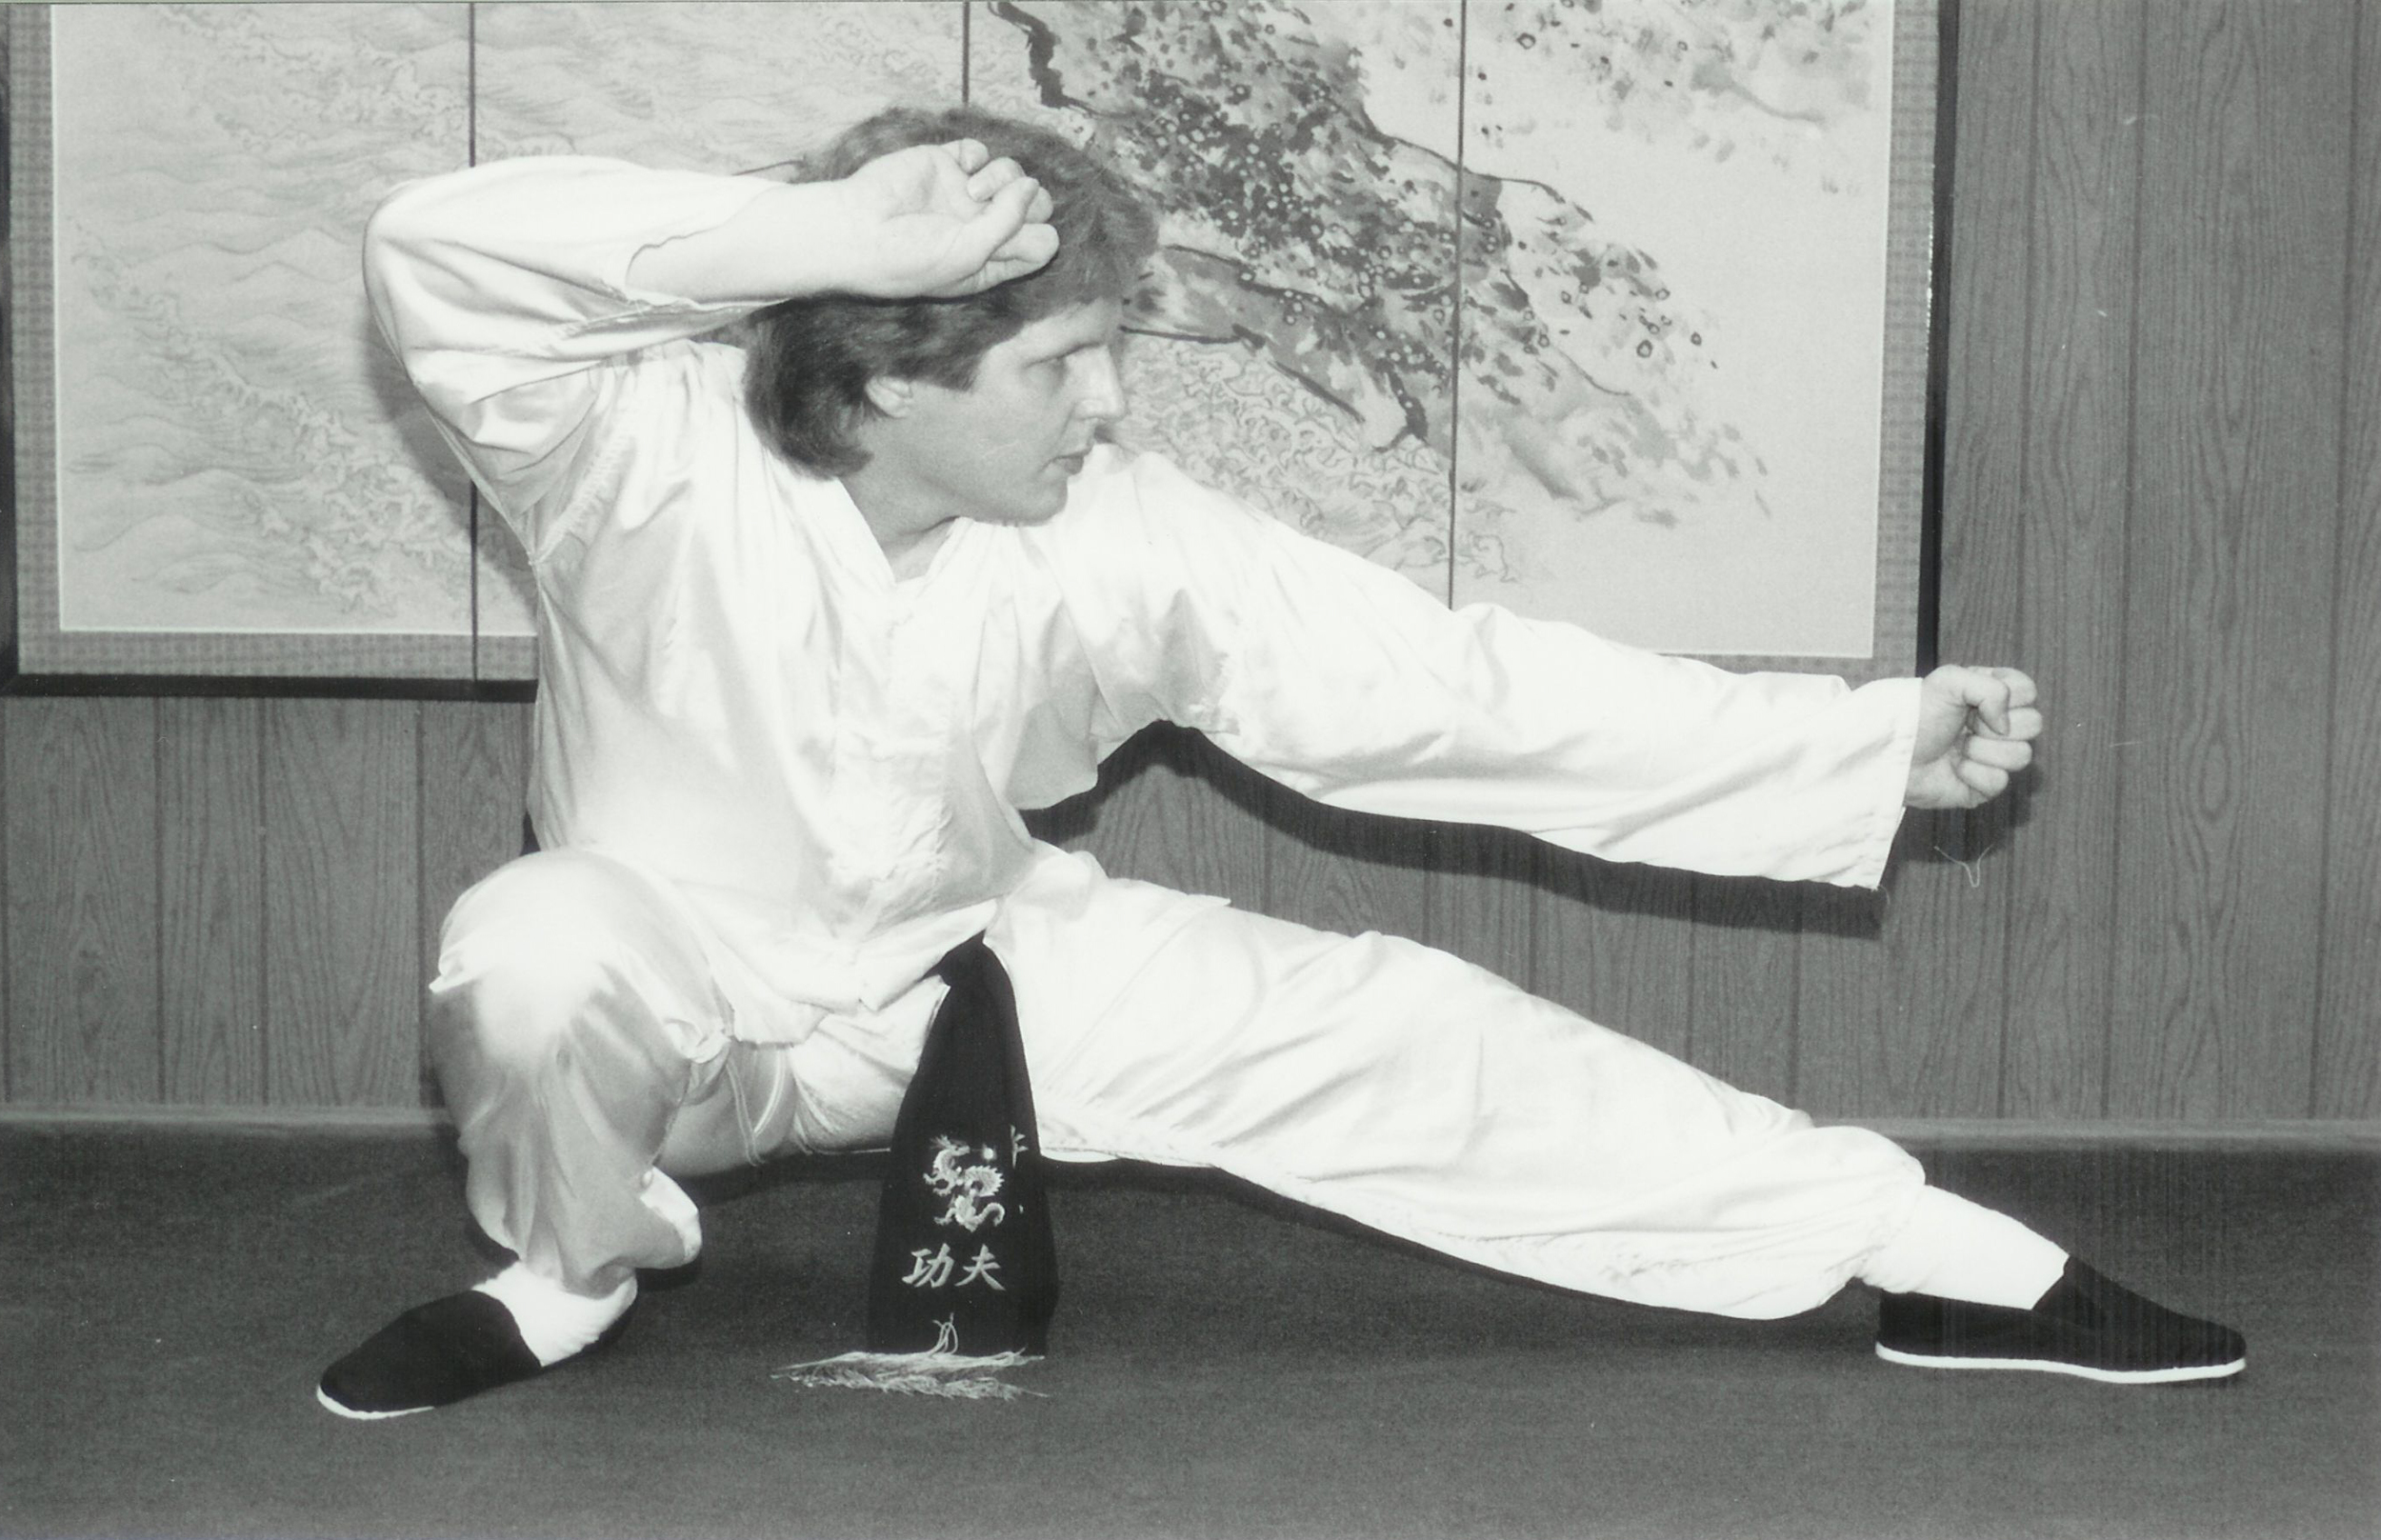 Chen Taiji Low Fist